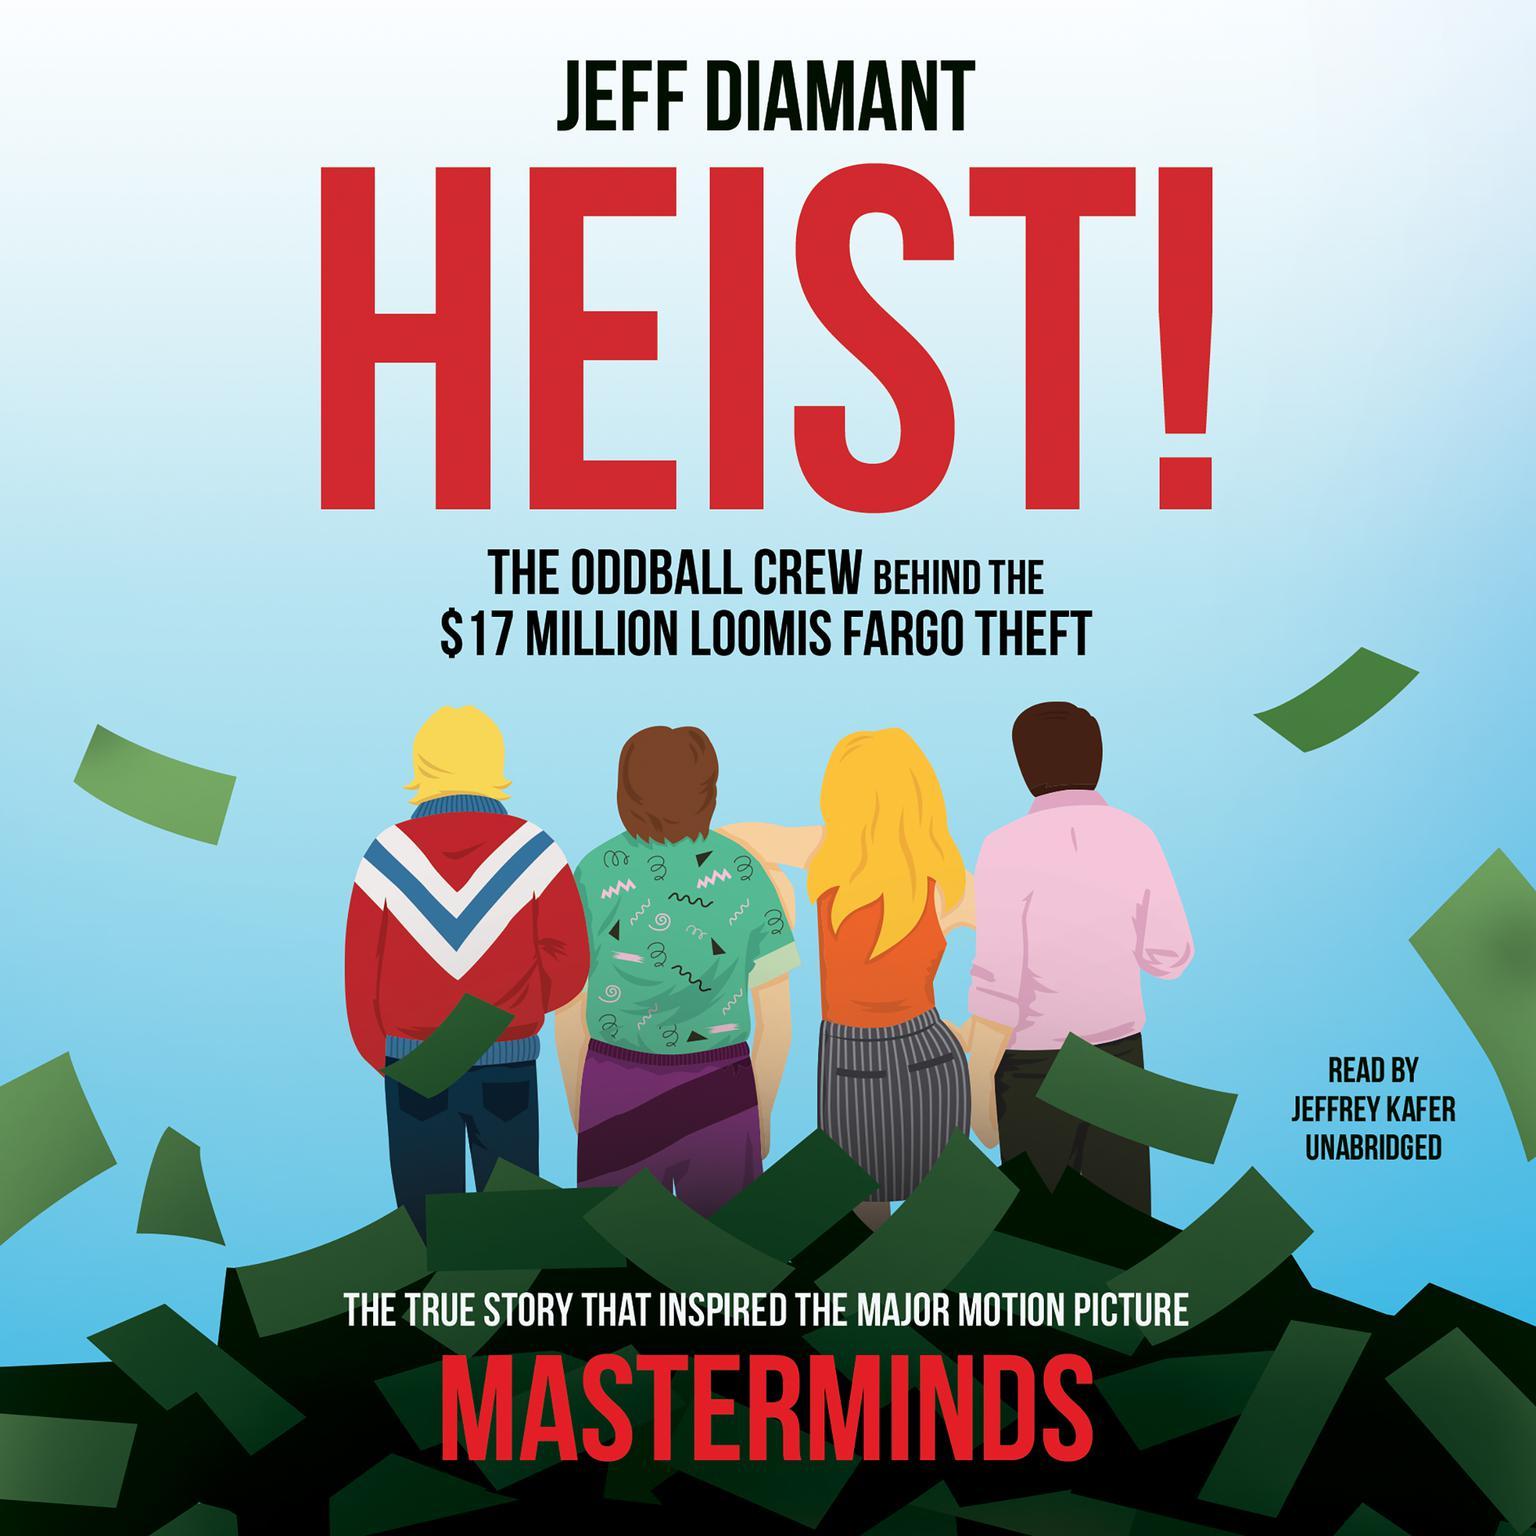 Heist: The Oddball Crew behind the $17 Million Loomis Fargo Theft Audiobook, by Jeff Diamant